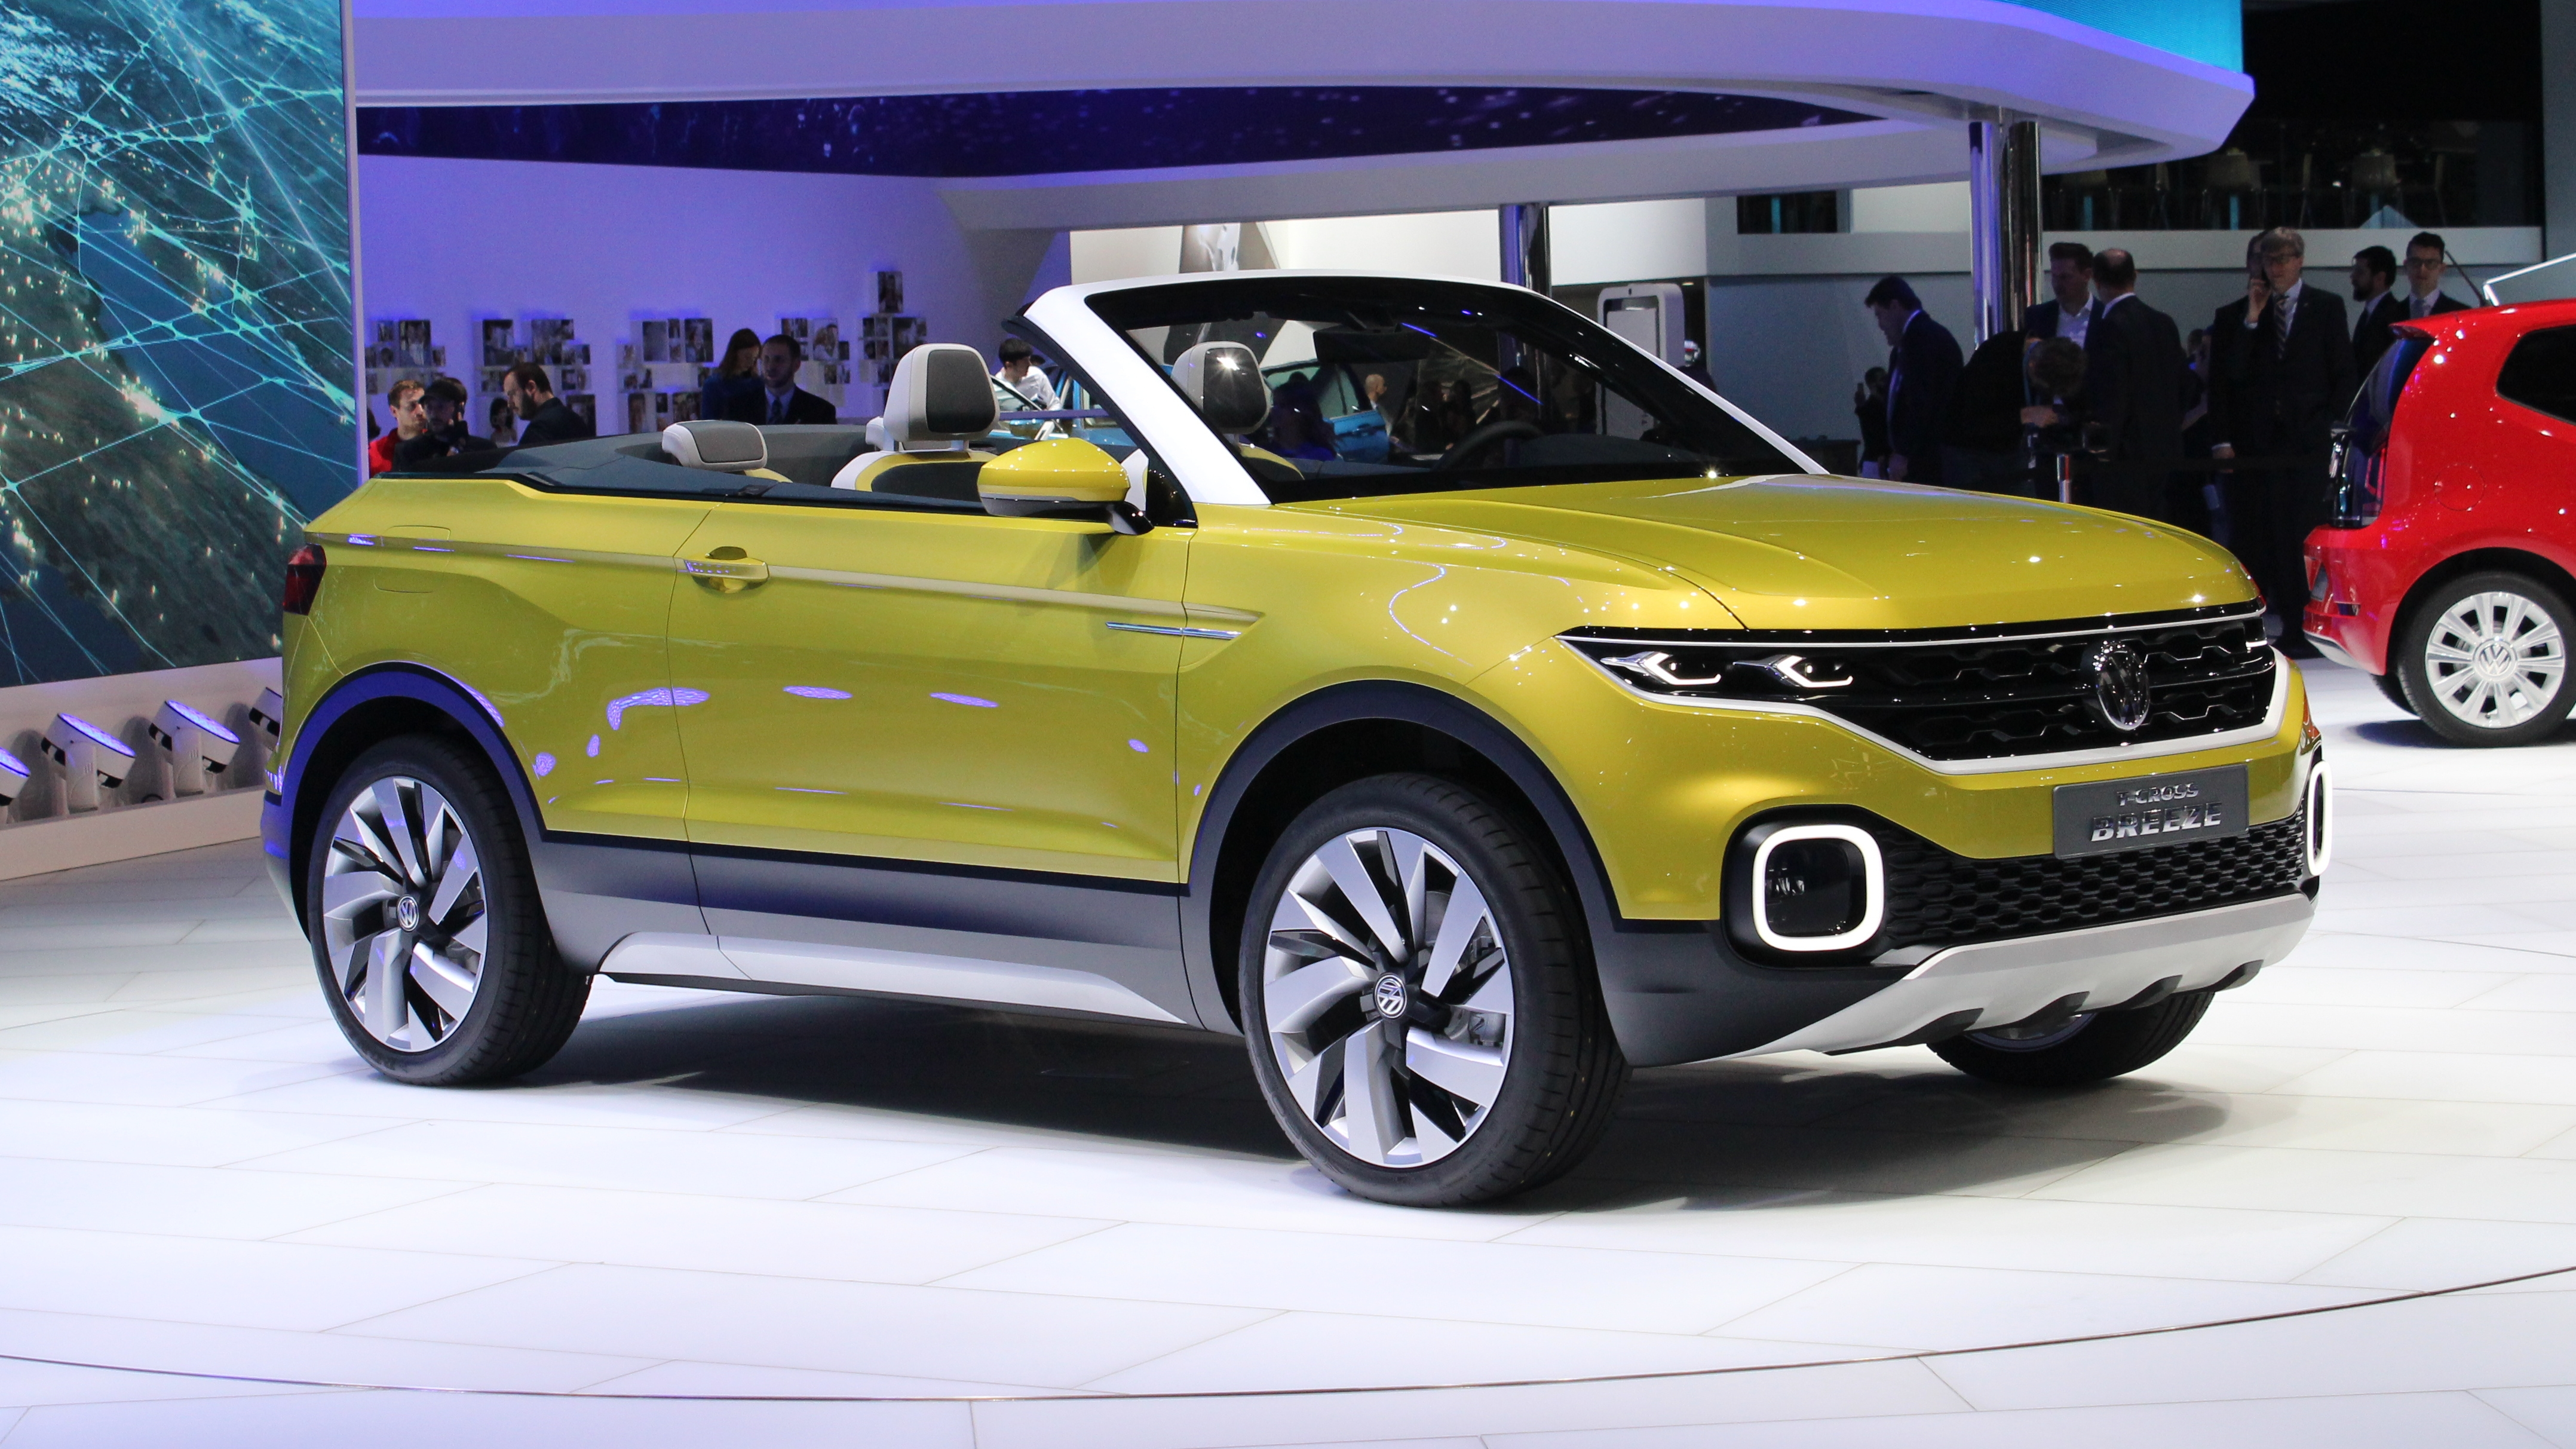 volkswagen t cross breeze concept future polo suv cabriolet en direct du salon de gen ve. Black Bedroom Furniture Sets. Home Design Ideas